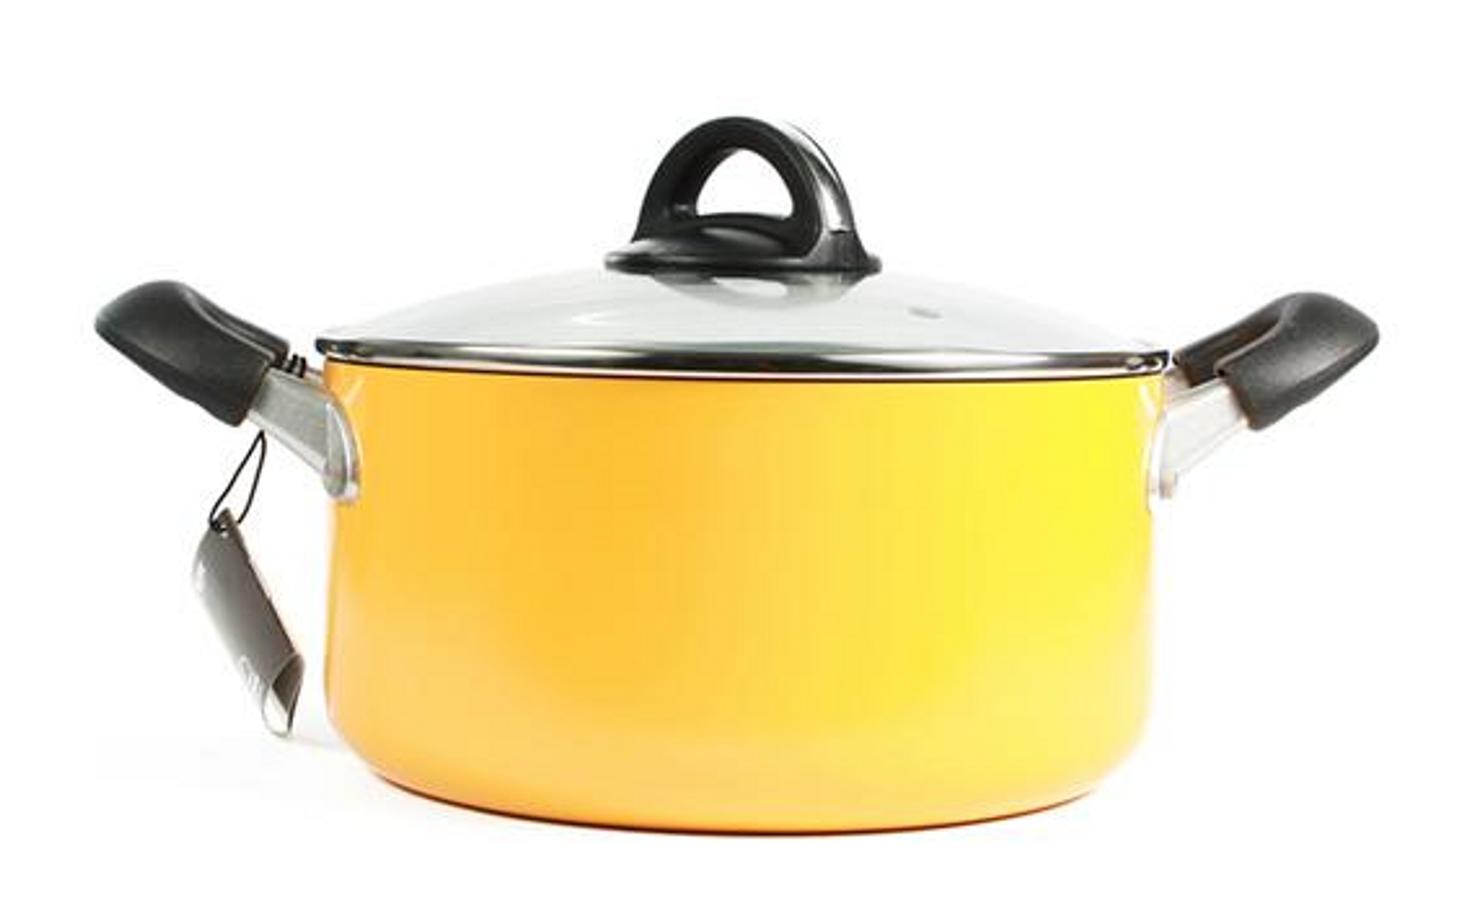 Nồi Nhôm E-cook LED2242G 24cm